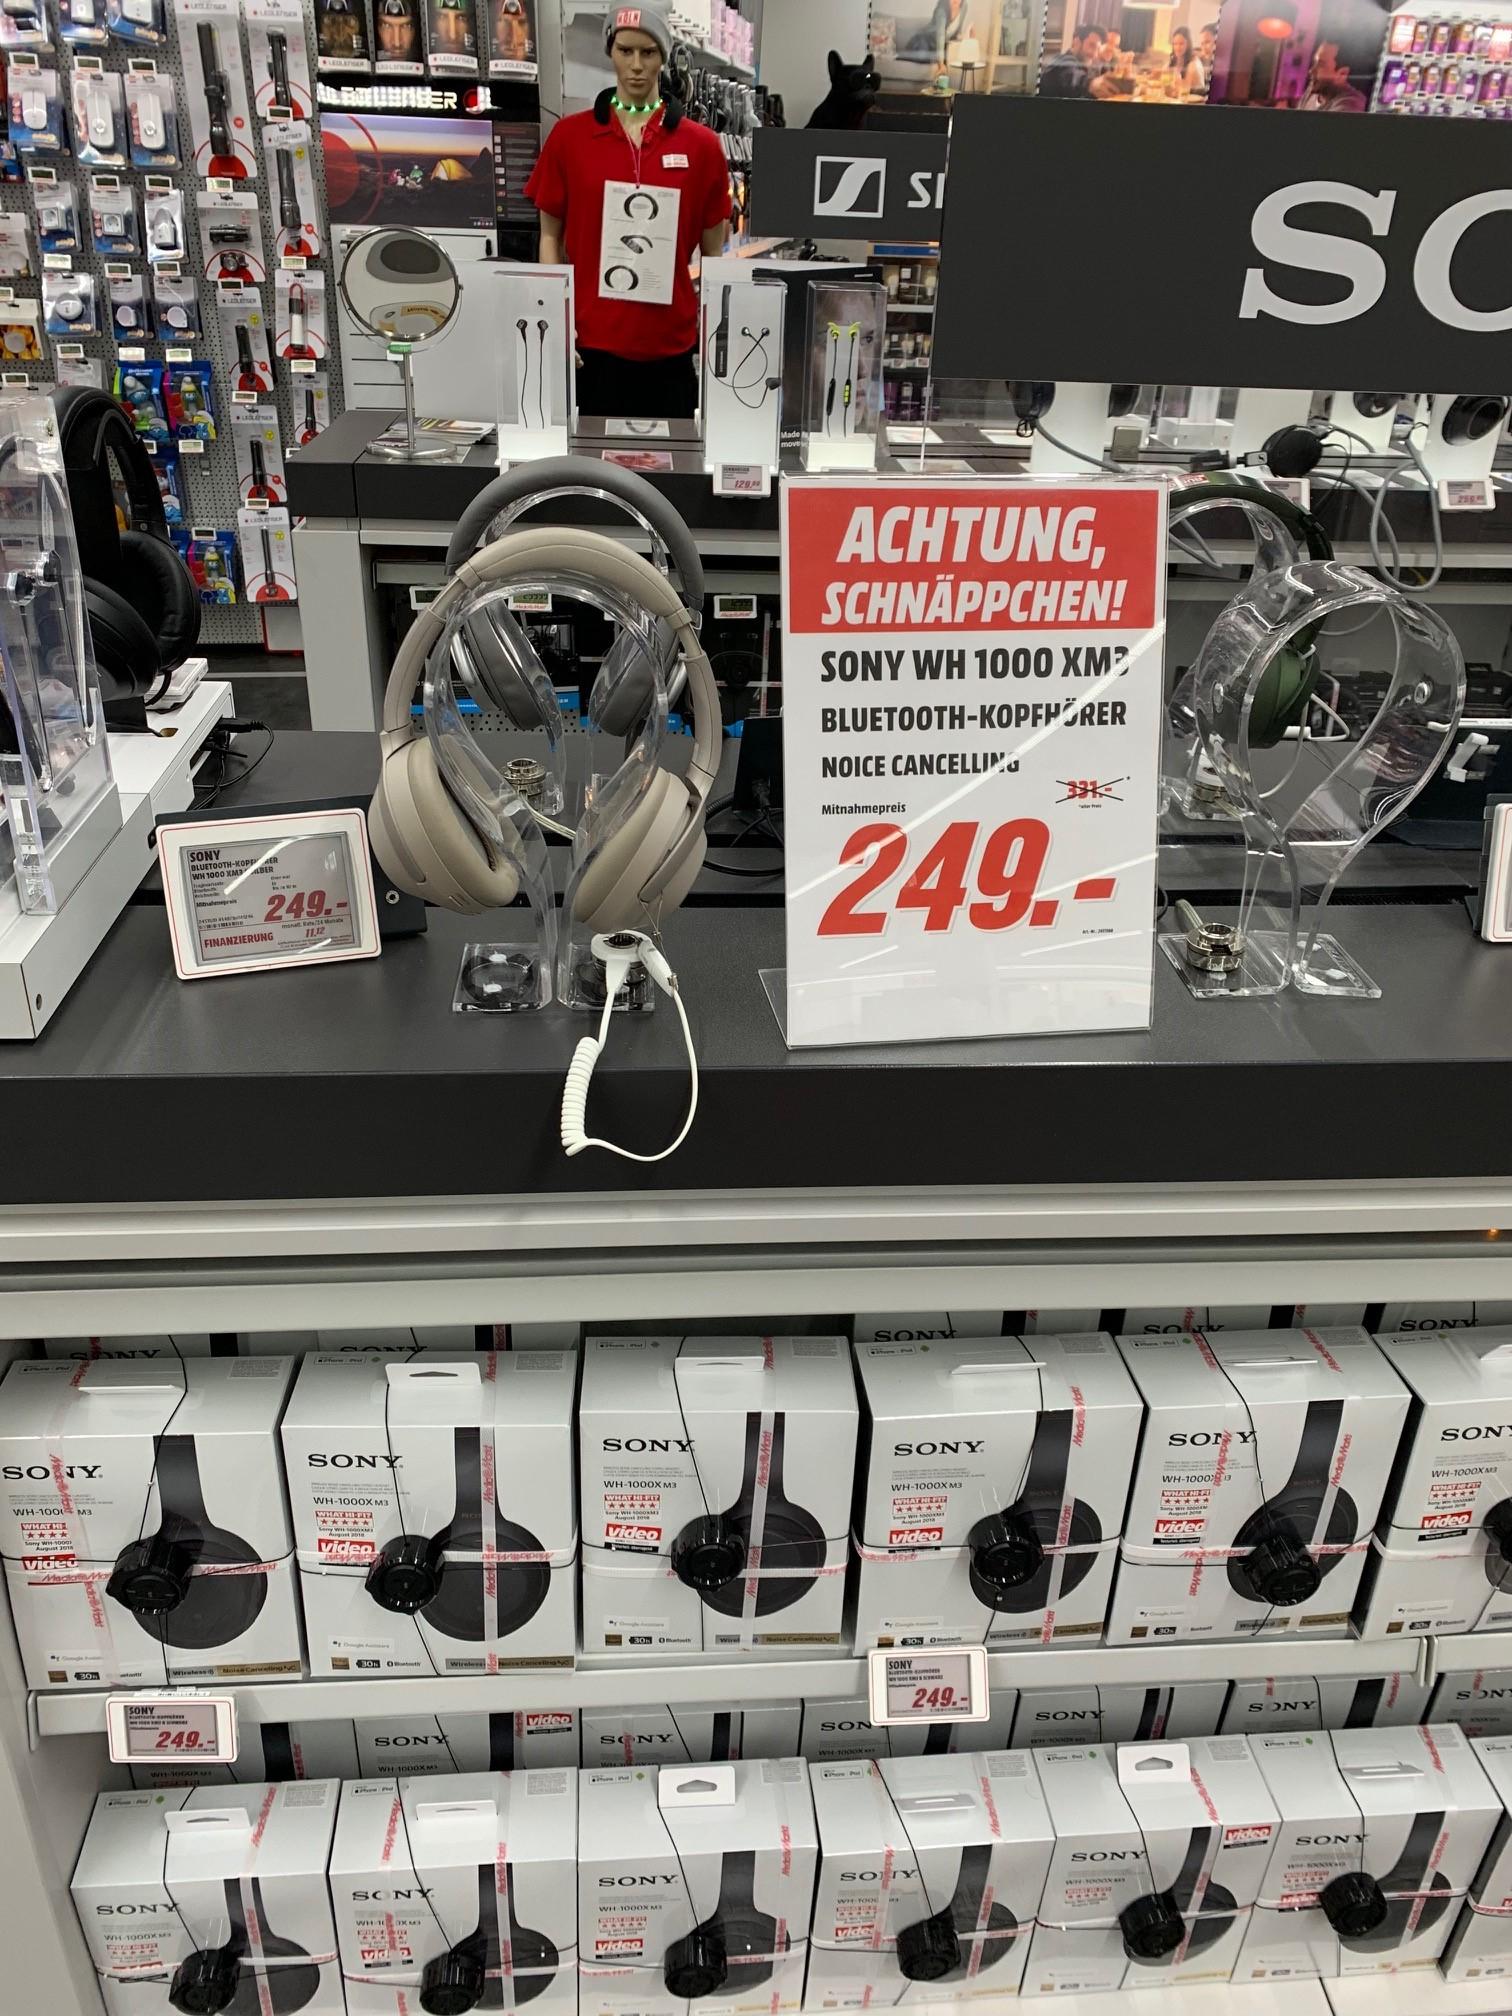 [Lokal Media Markt Köln City am Dom ] Sony WH 1000 XM 3 für 249€